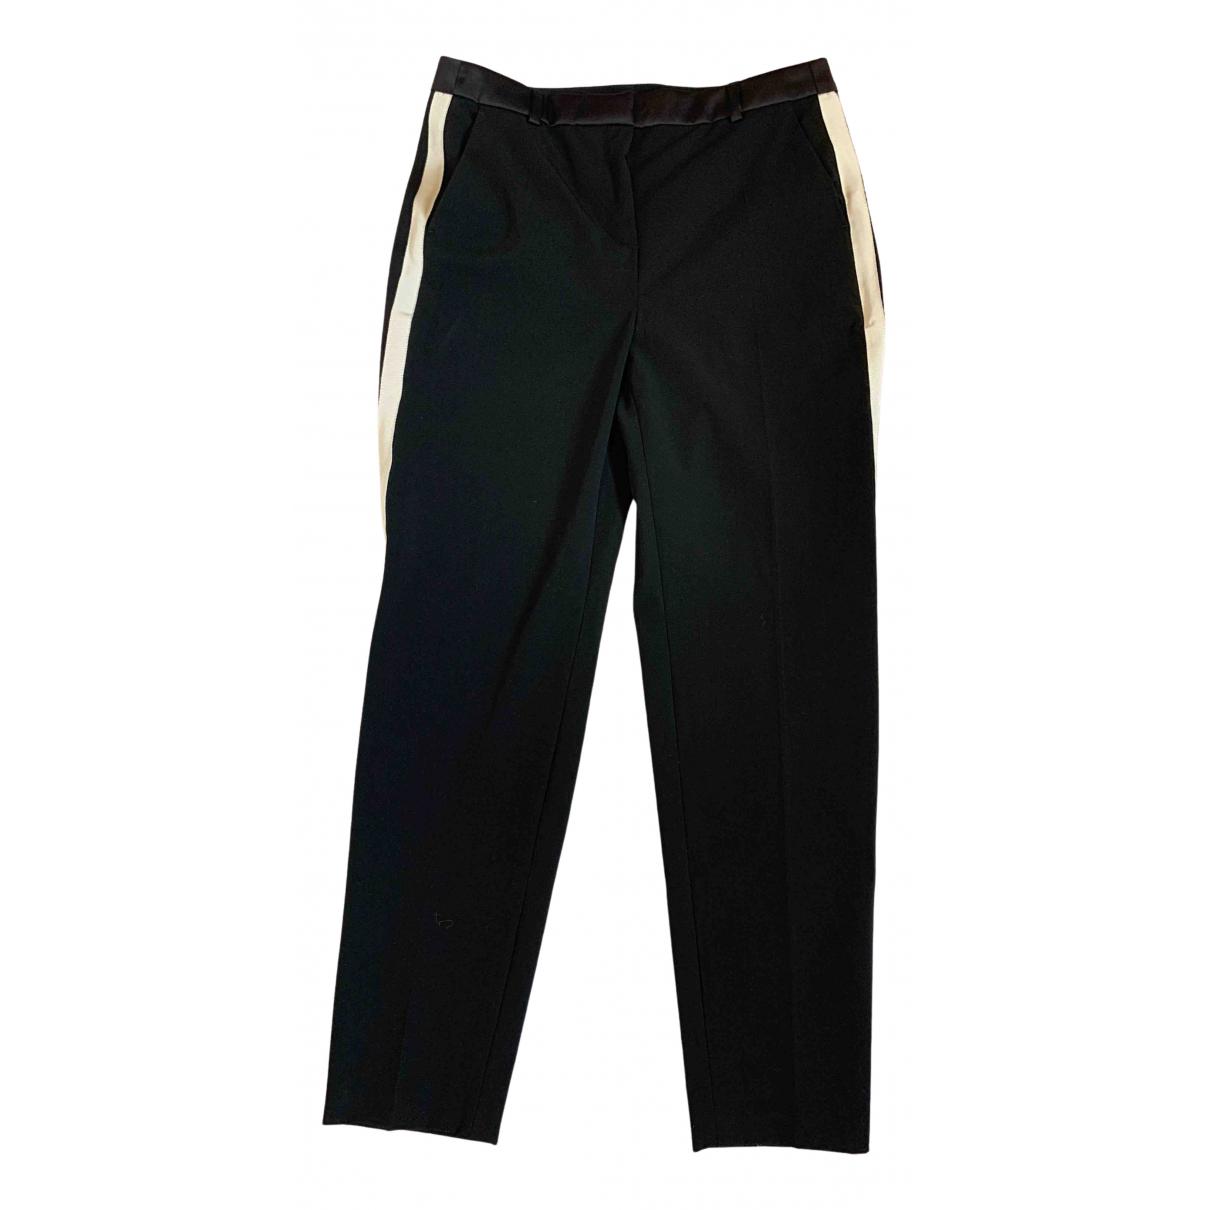 Karl Lagerfeld \N Black Trousers for Women 38 FR